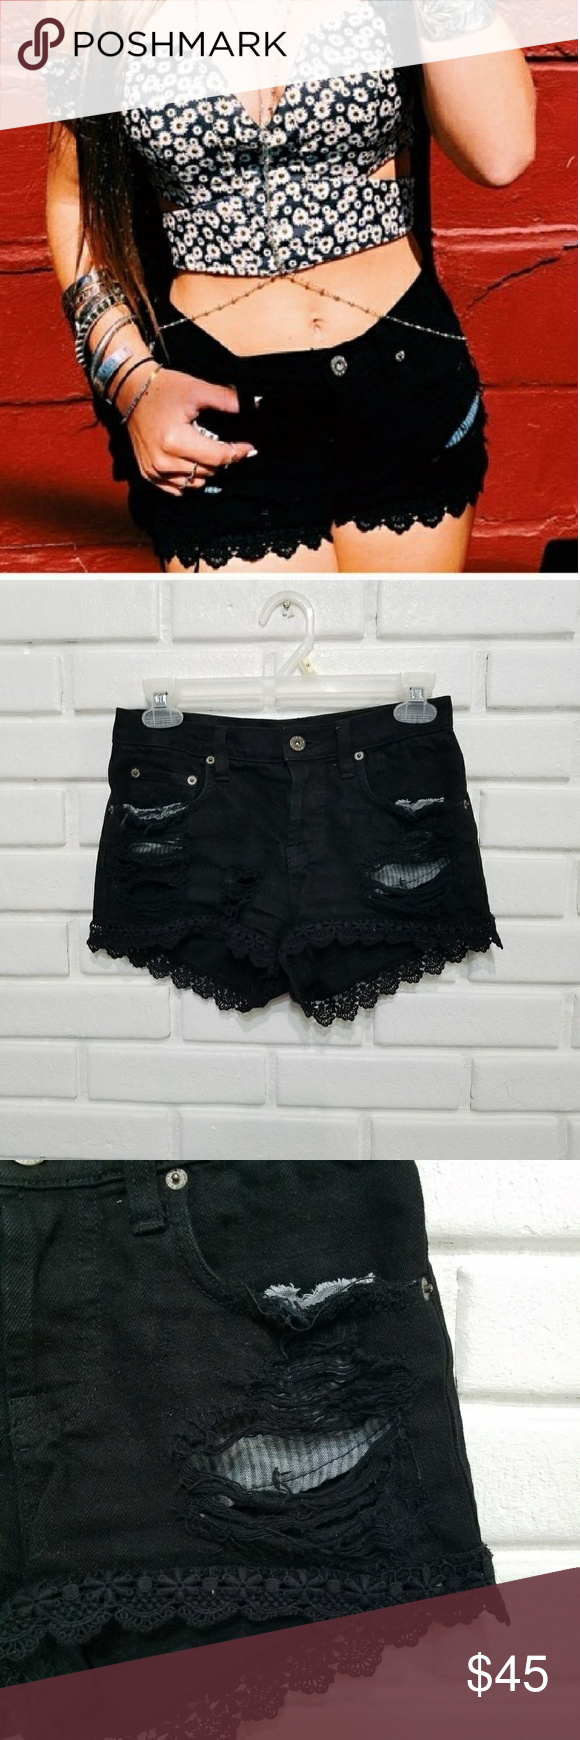 ebbdf20d55 Carmar Black Distressed Lace Trim Shorts 24 Carmar Black Distressed Lace  Trim Shorts size 24.